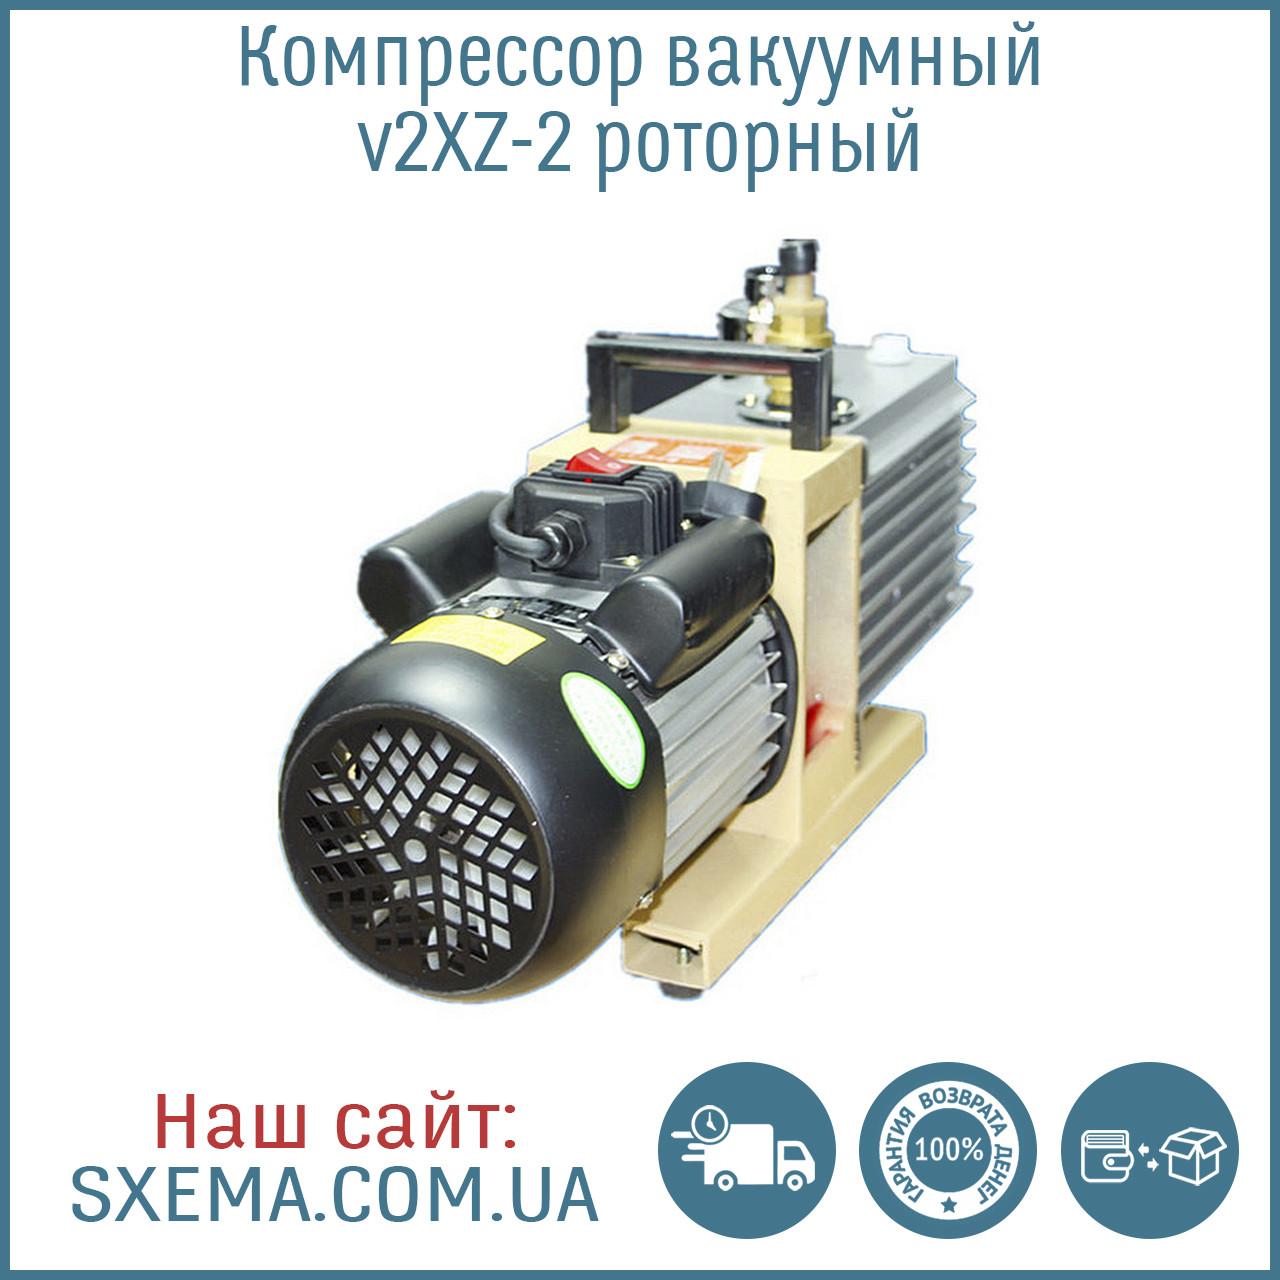 Компрессор вакуумный 2XZ-2 роторный (2 л/с, 6*10-2 Pa, 220V 370W, 27kg 148*227*478,